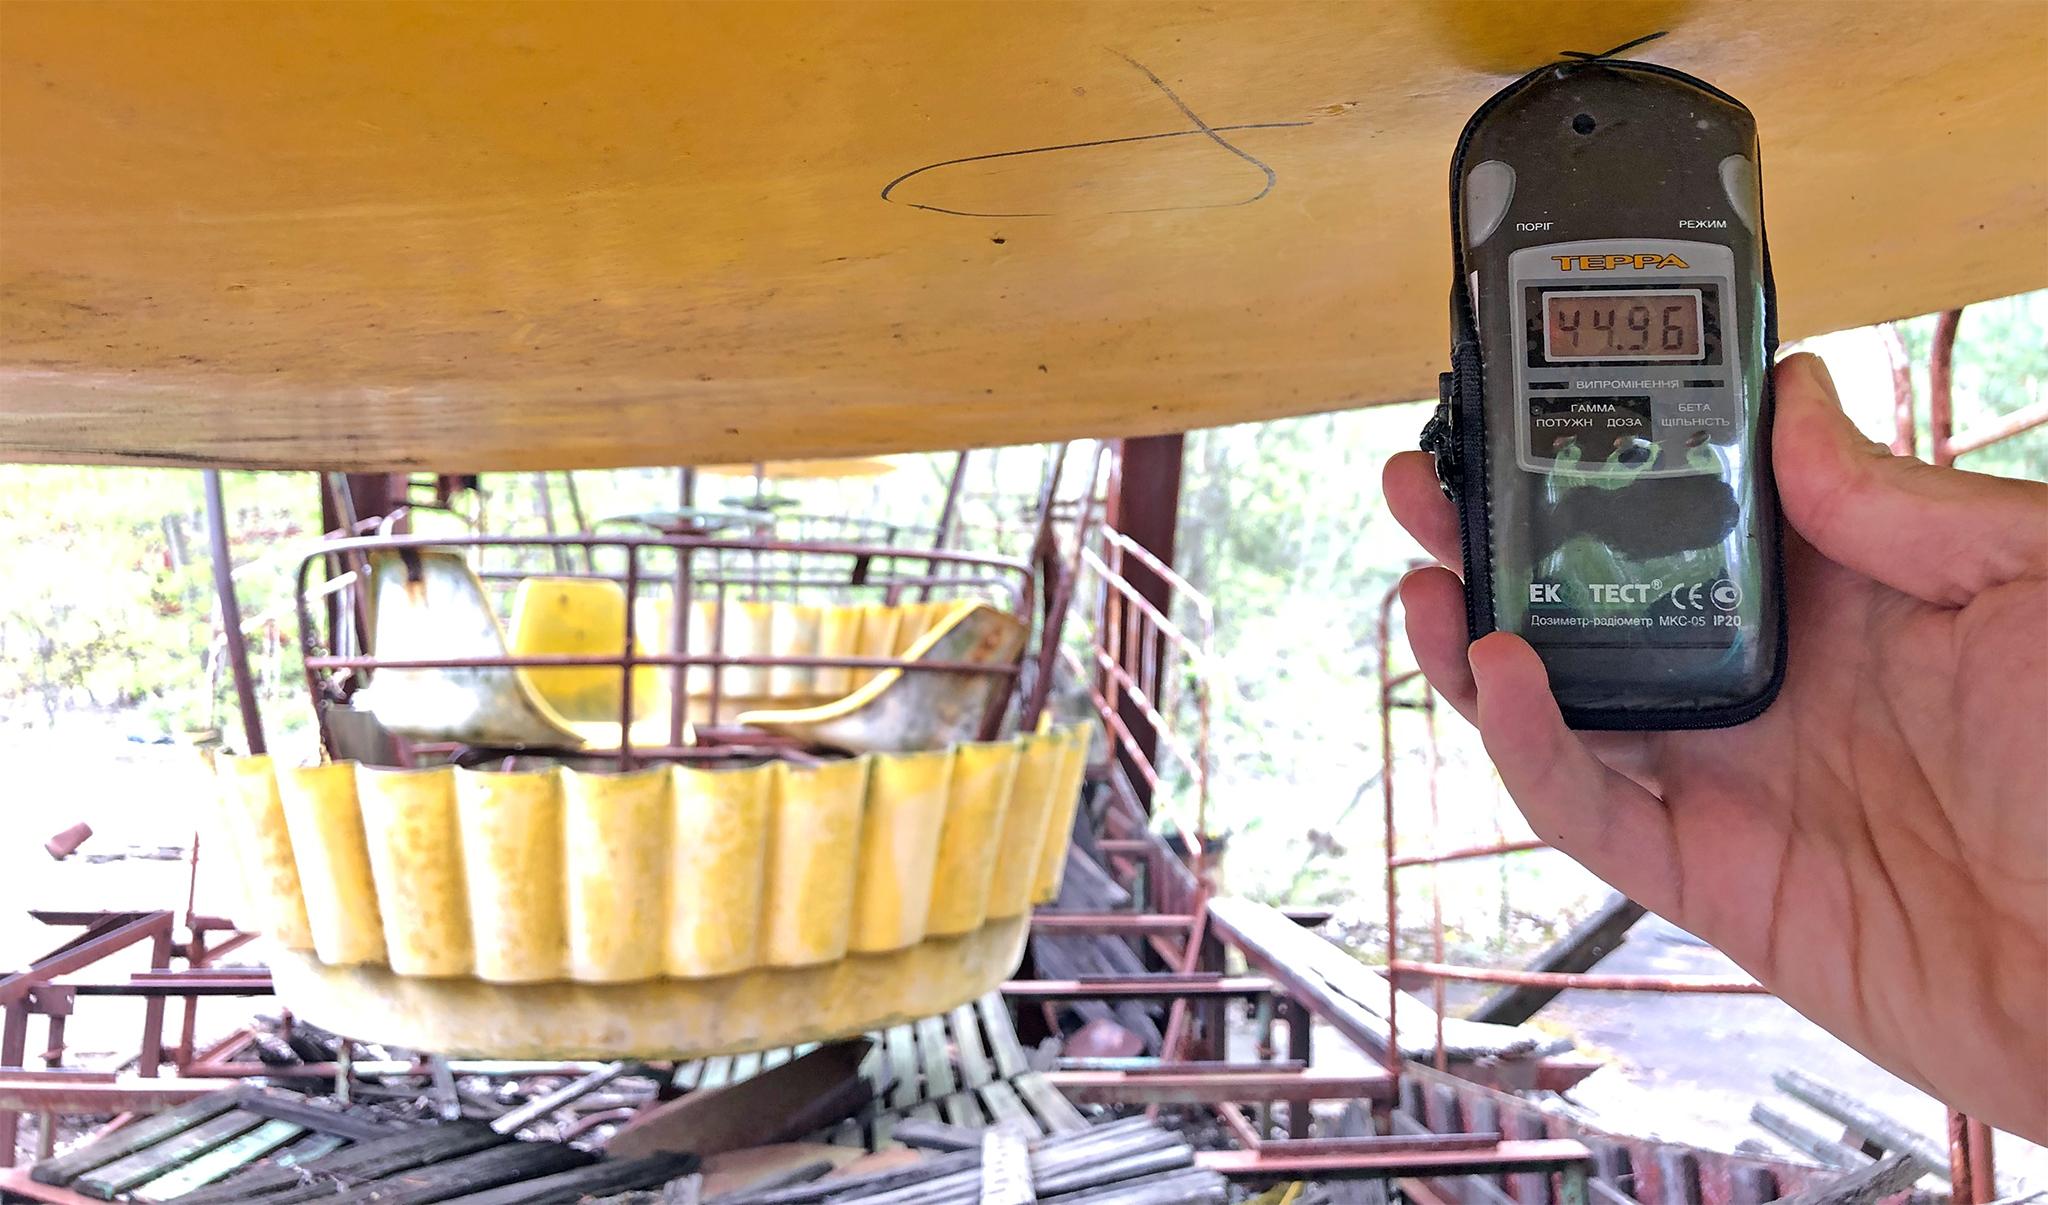 Visitar Chernóbil - Visitar Chernobyl Ucrania Ukraine Pripyat visitar chernóbil - 32891480987 ae0263a0cb o - Visitar Chernóbil: el lugar más contaminado del planeta